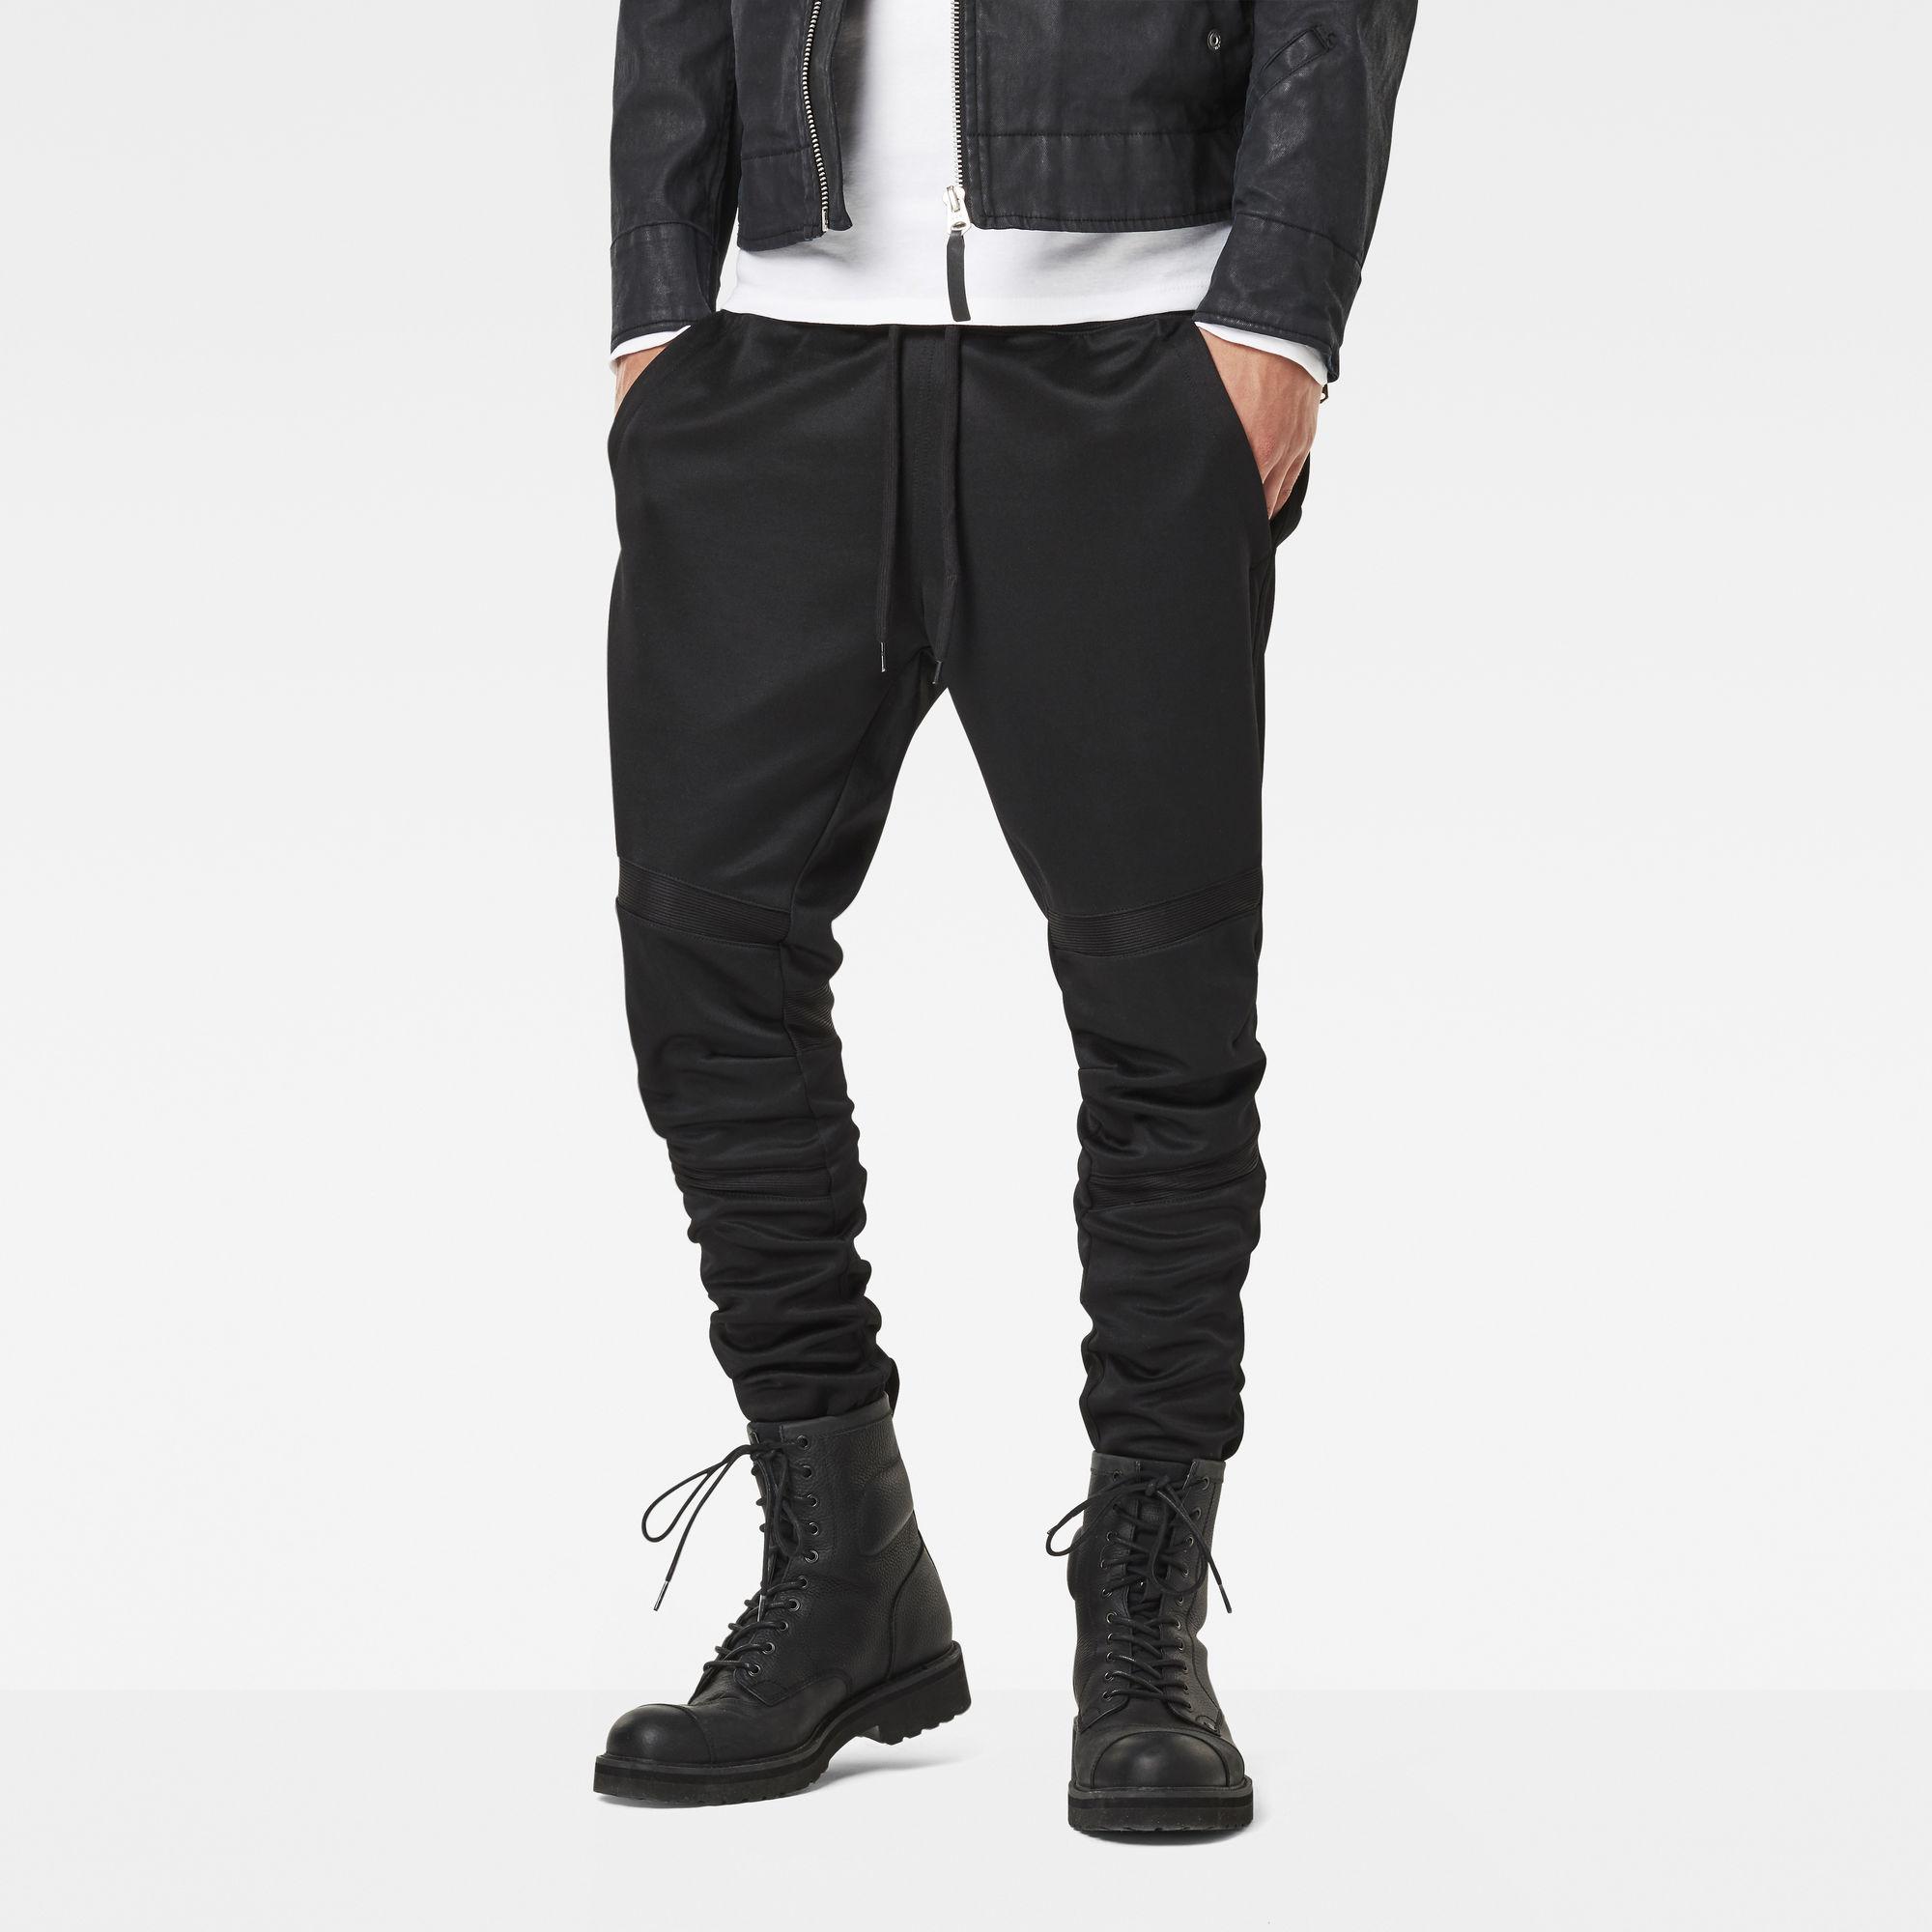 Motac Super Slim Sweatpants